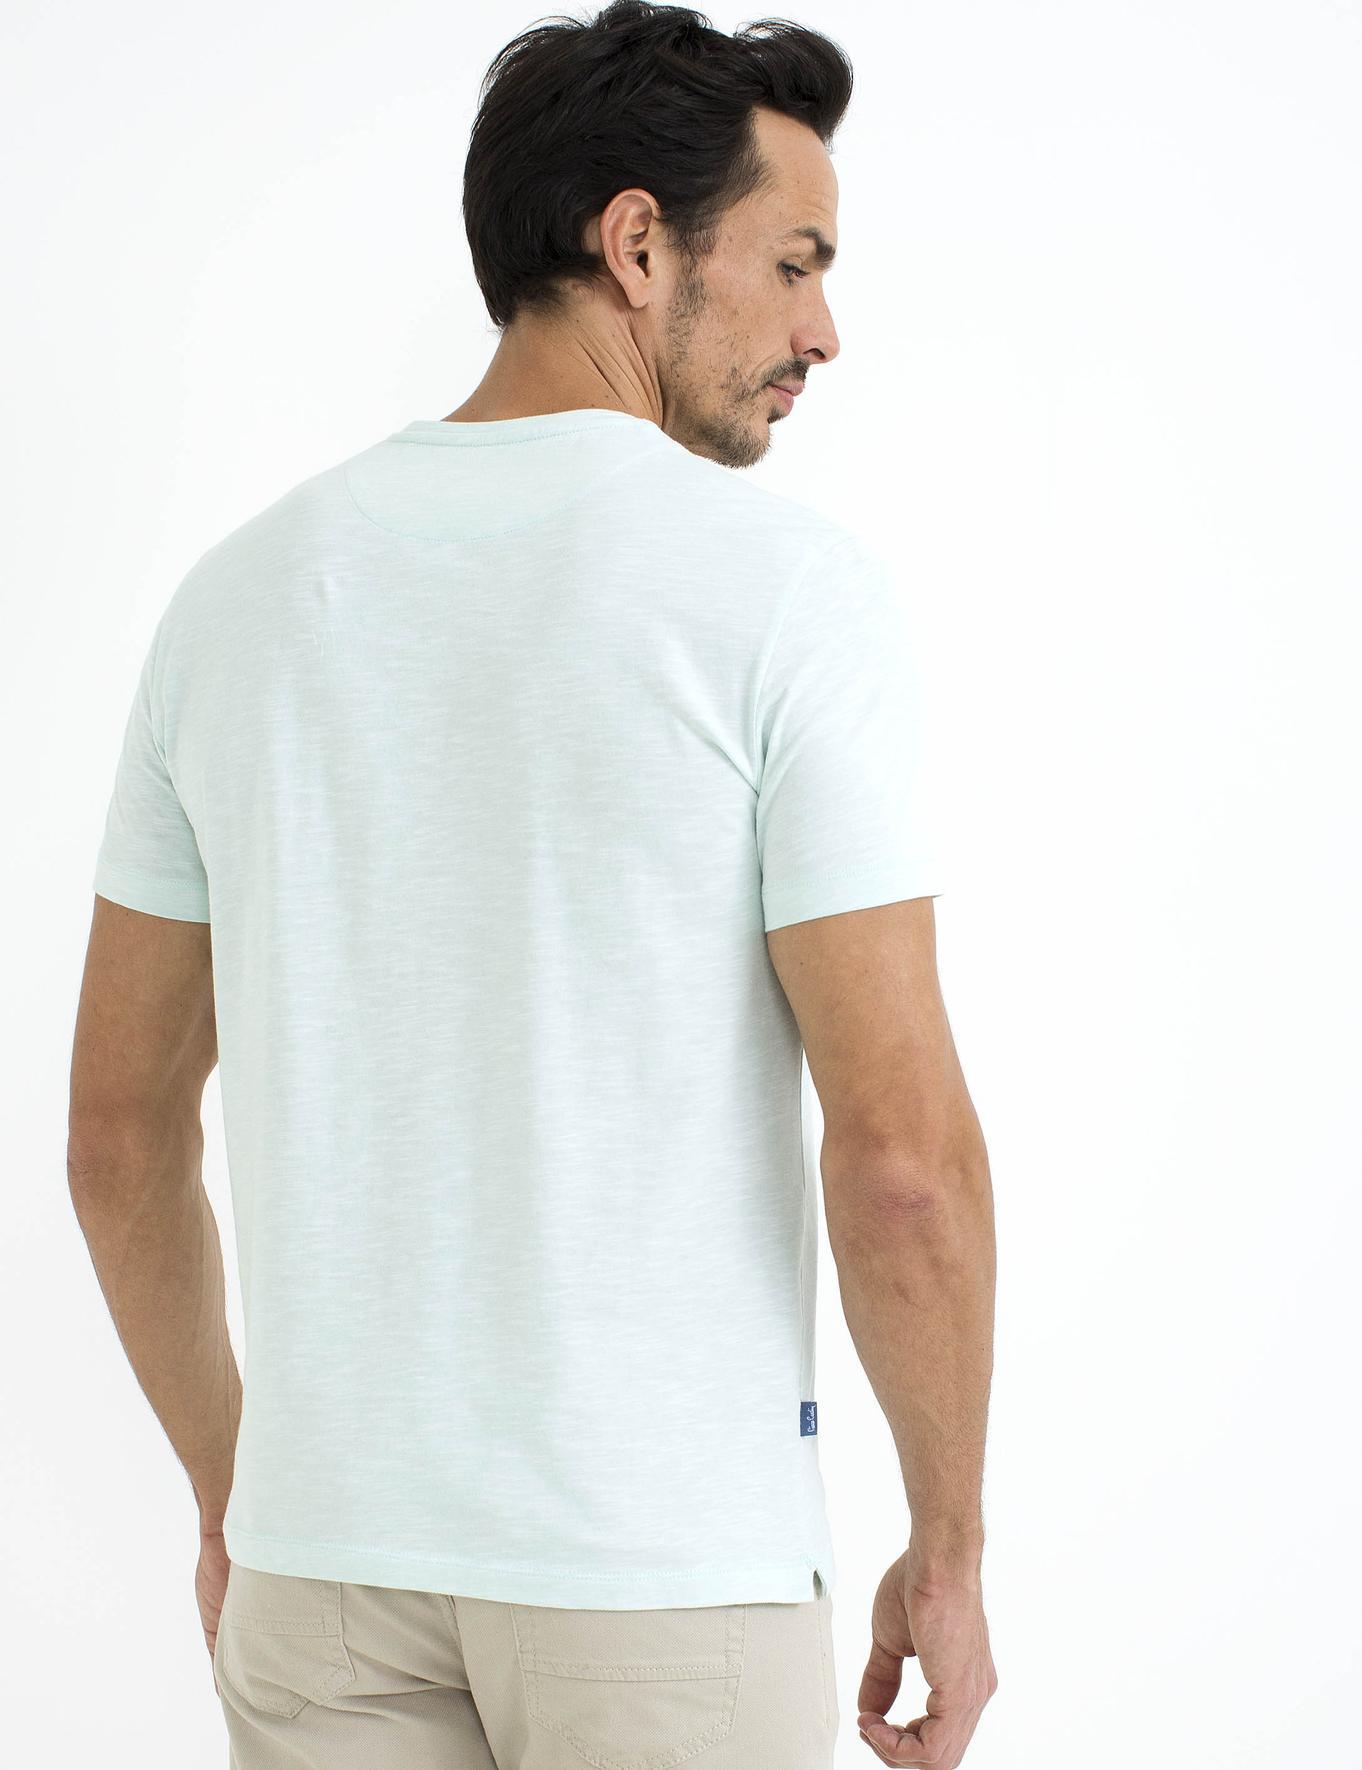 Açık Yeşil Slim Fit T-Shirt